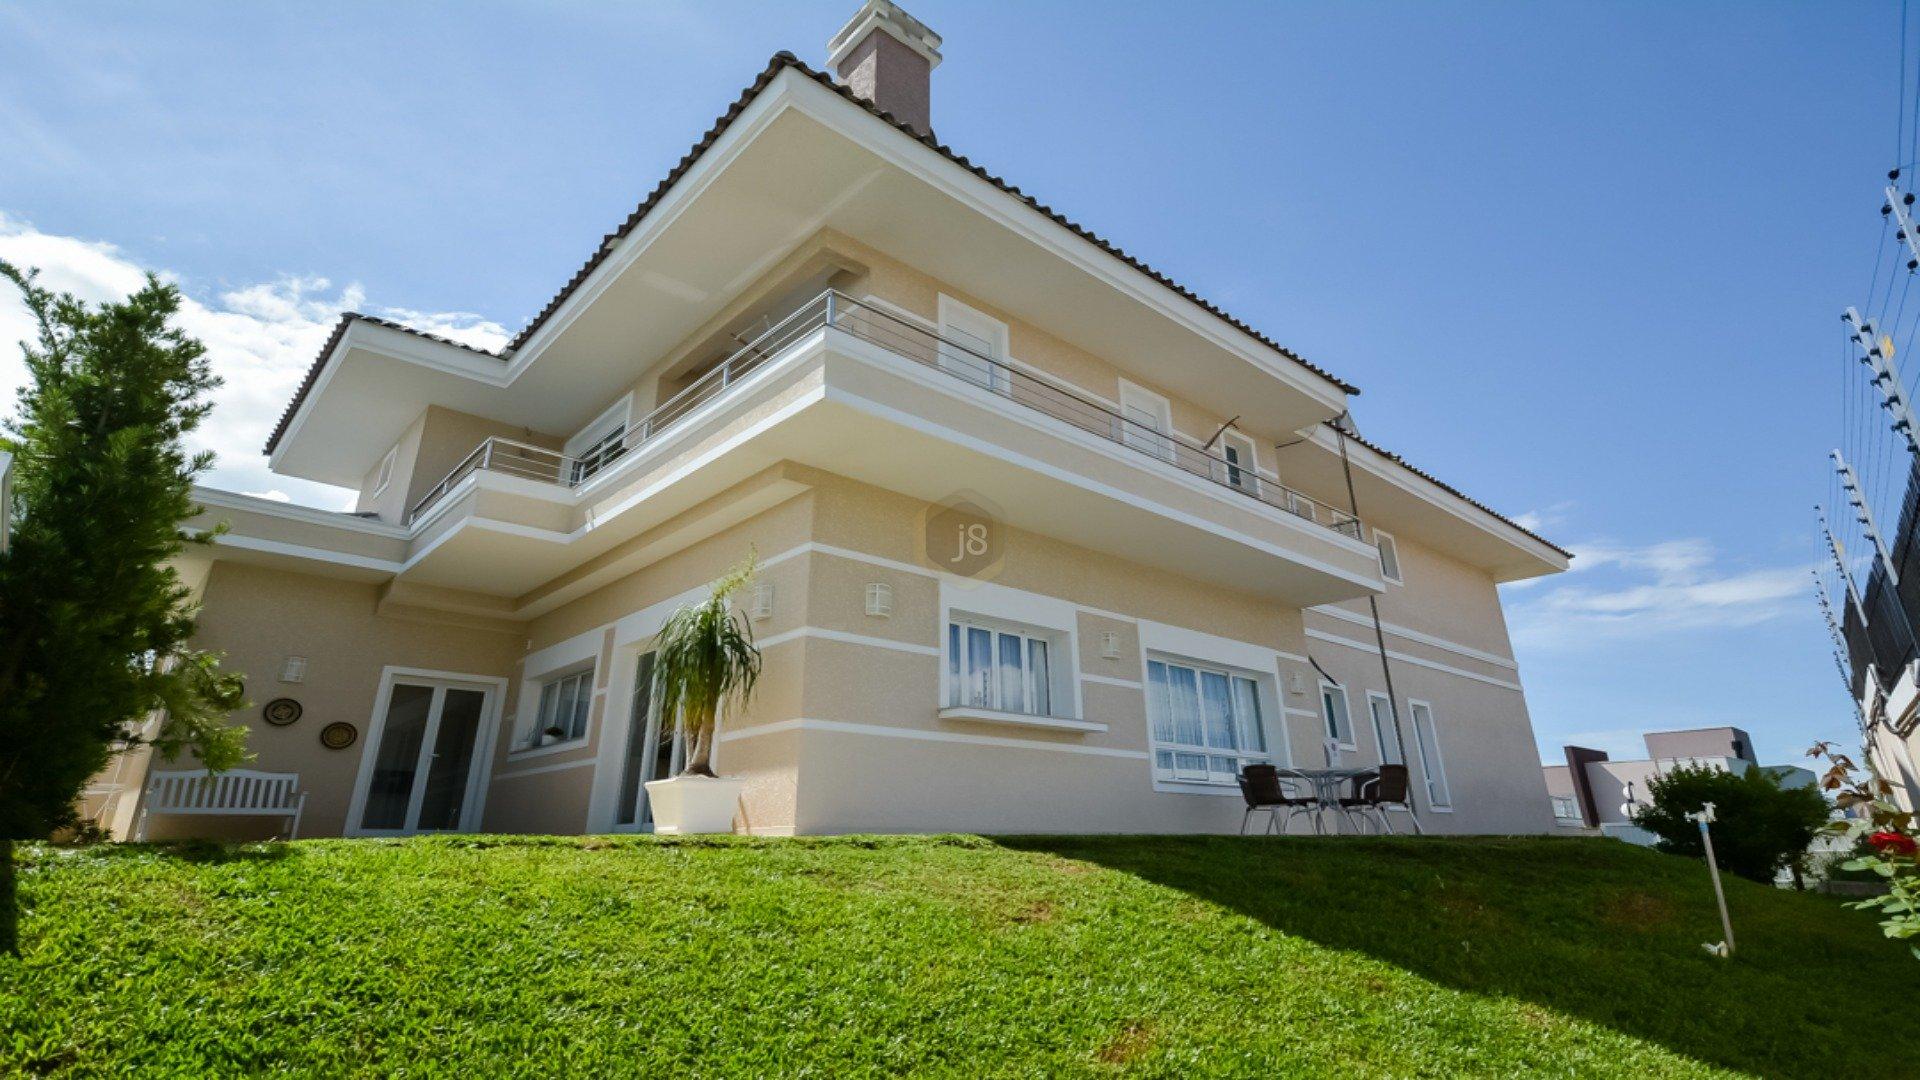 Foto de destaque Casa no paysage provence !!